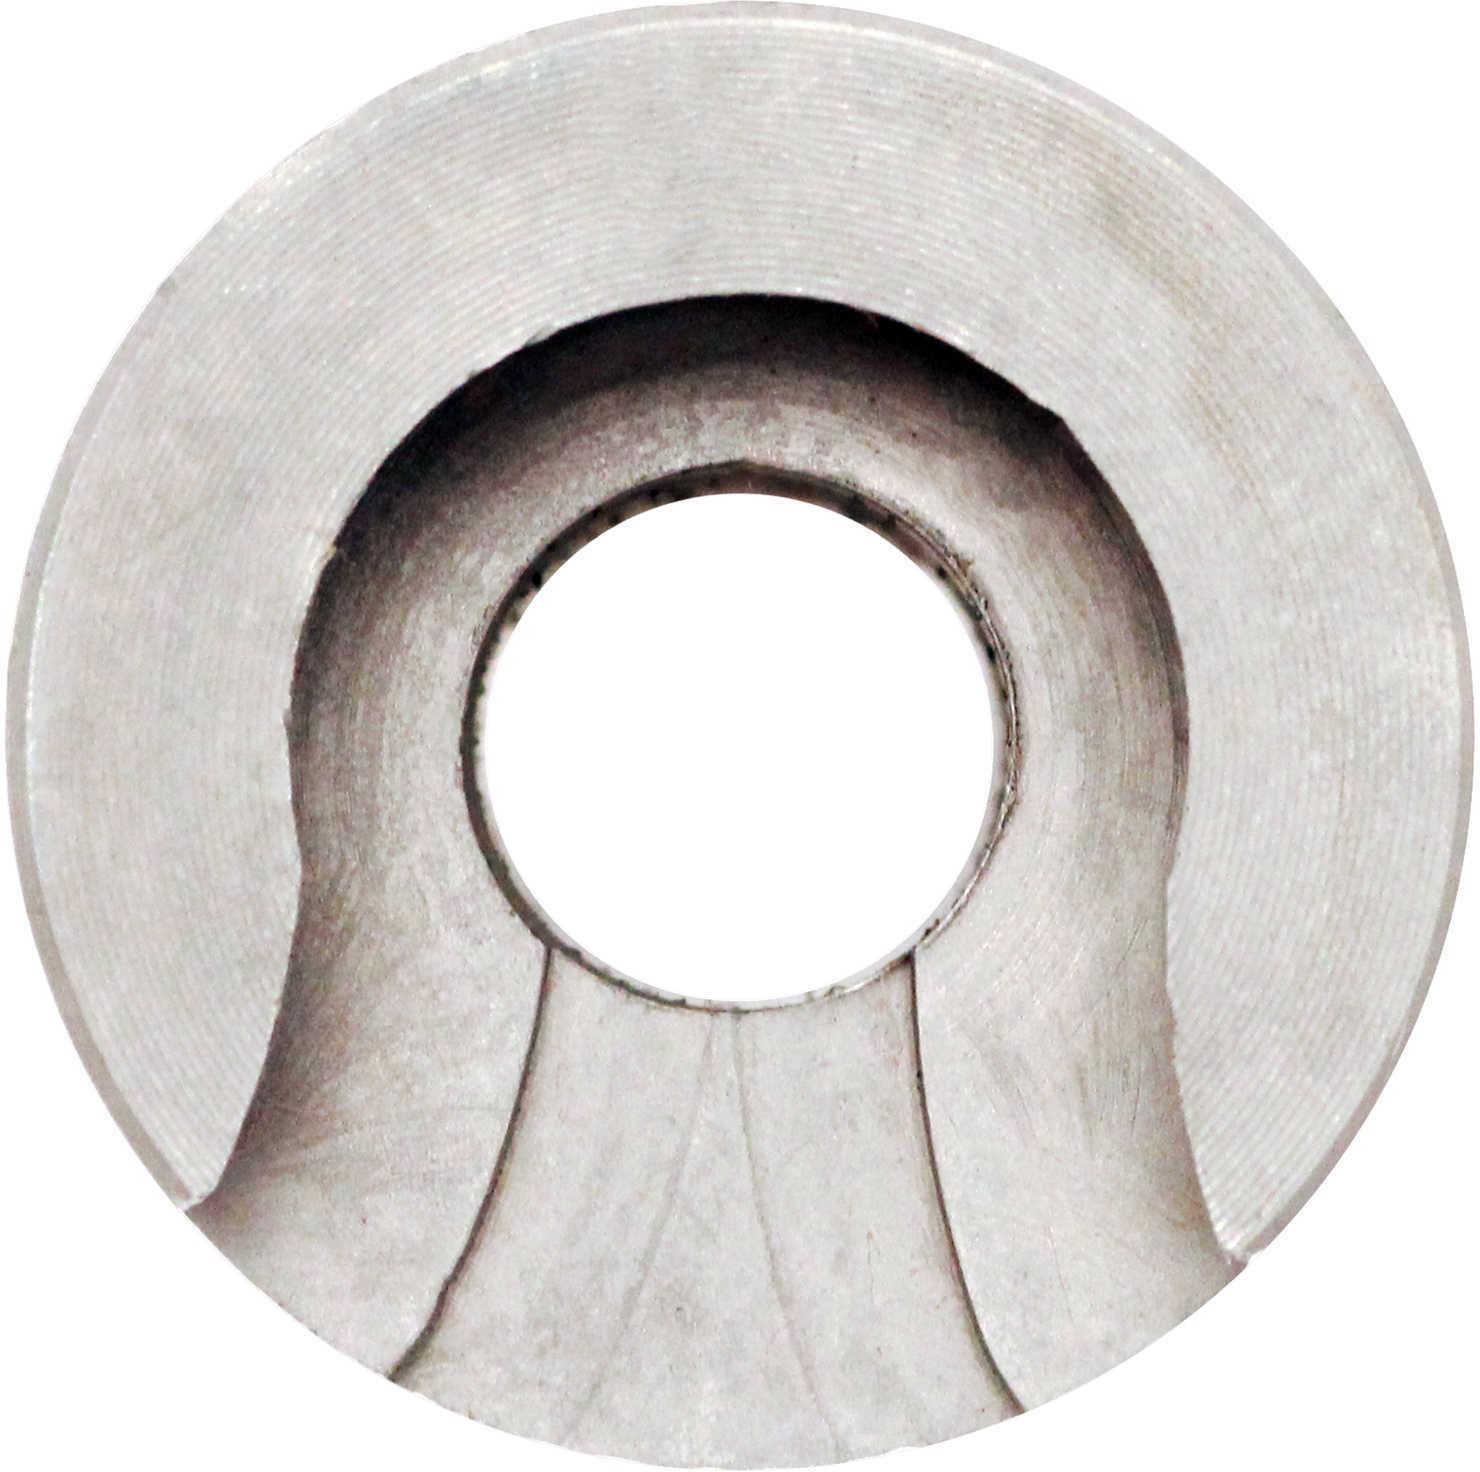 Hornady Shell Holder Size 21 Md: 390561